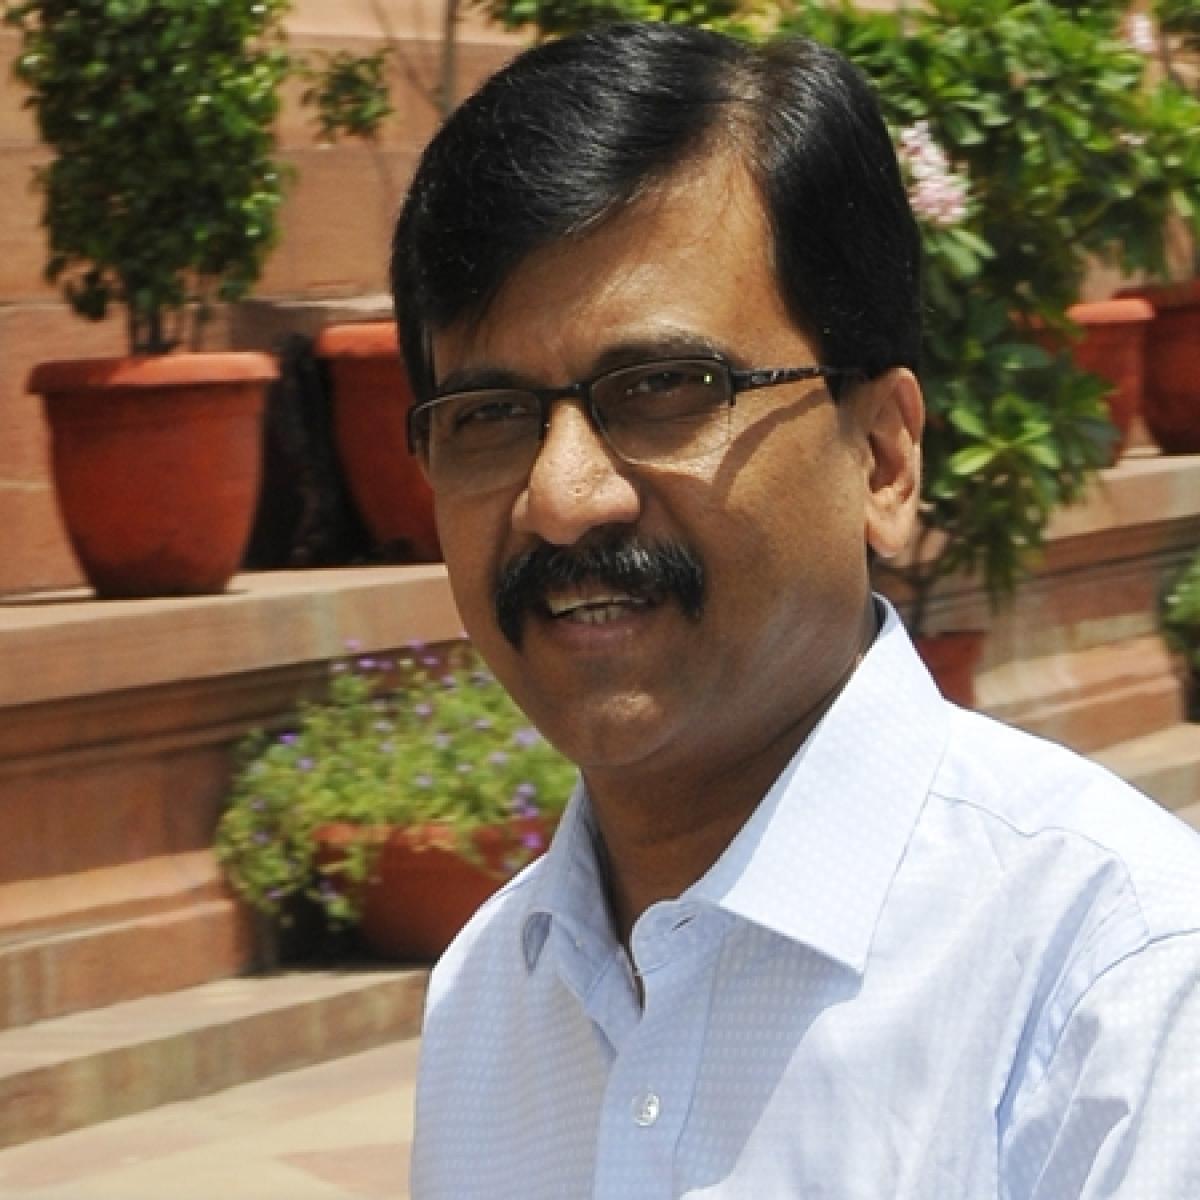 If Rahul Gandhi wants to visit Jammu and Kashmir for enjoyment, will make arrangements: Sanjay Raut